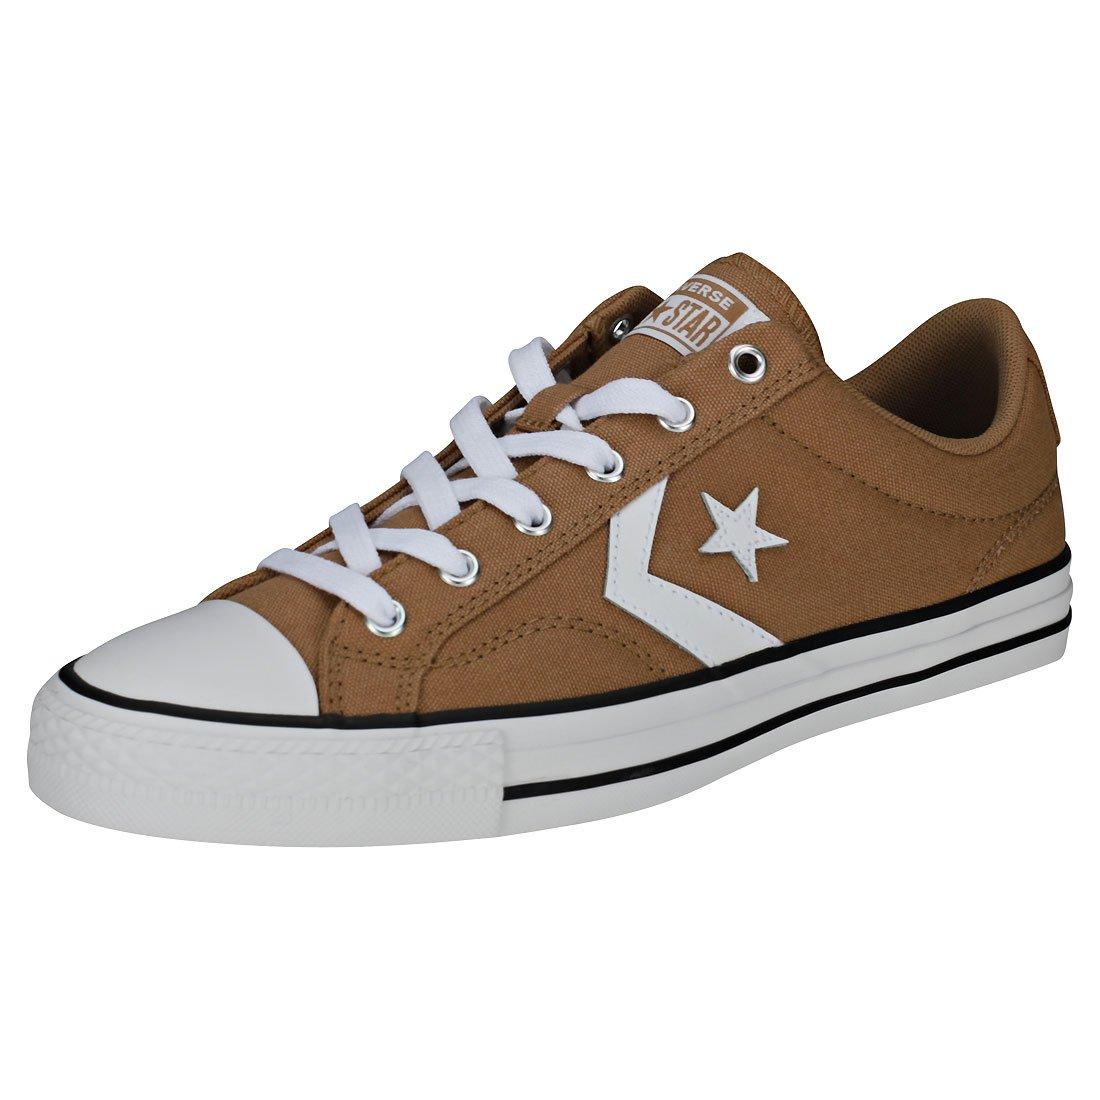 Converse Star Player Ox, Zapatillas de Deporte Unisex Adulto 40 EU|Multicolor (Teak/White/White 234)